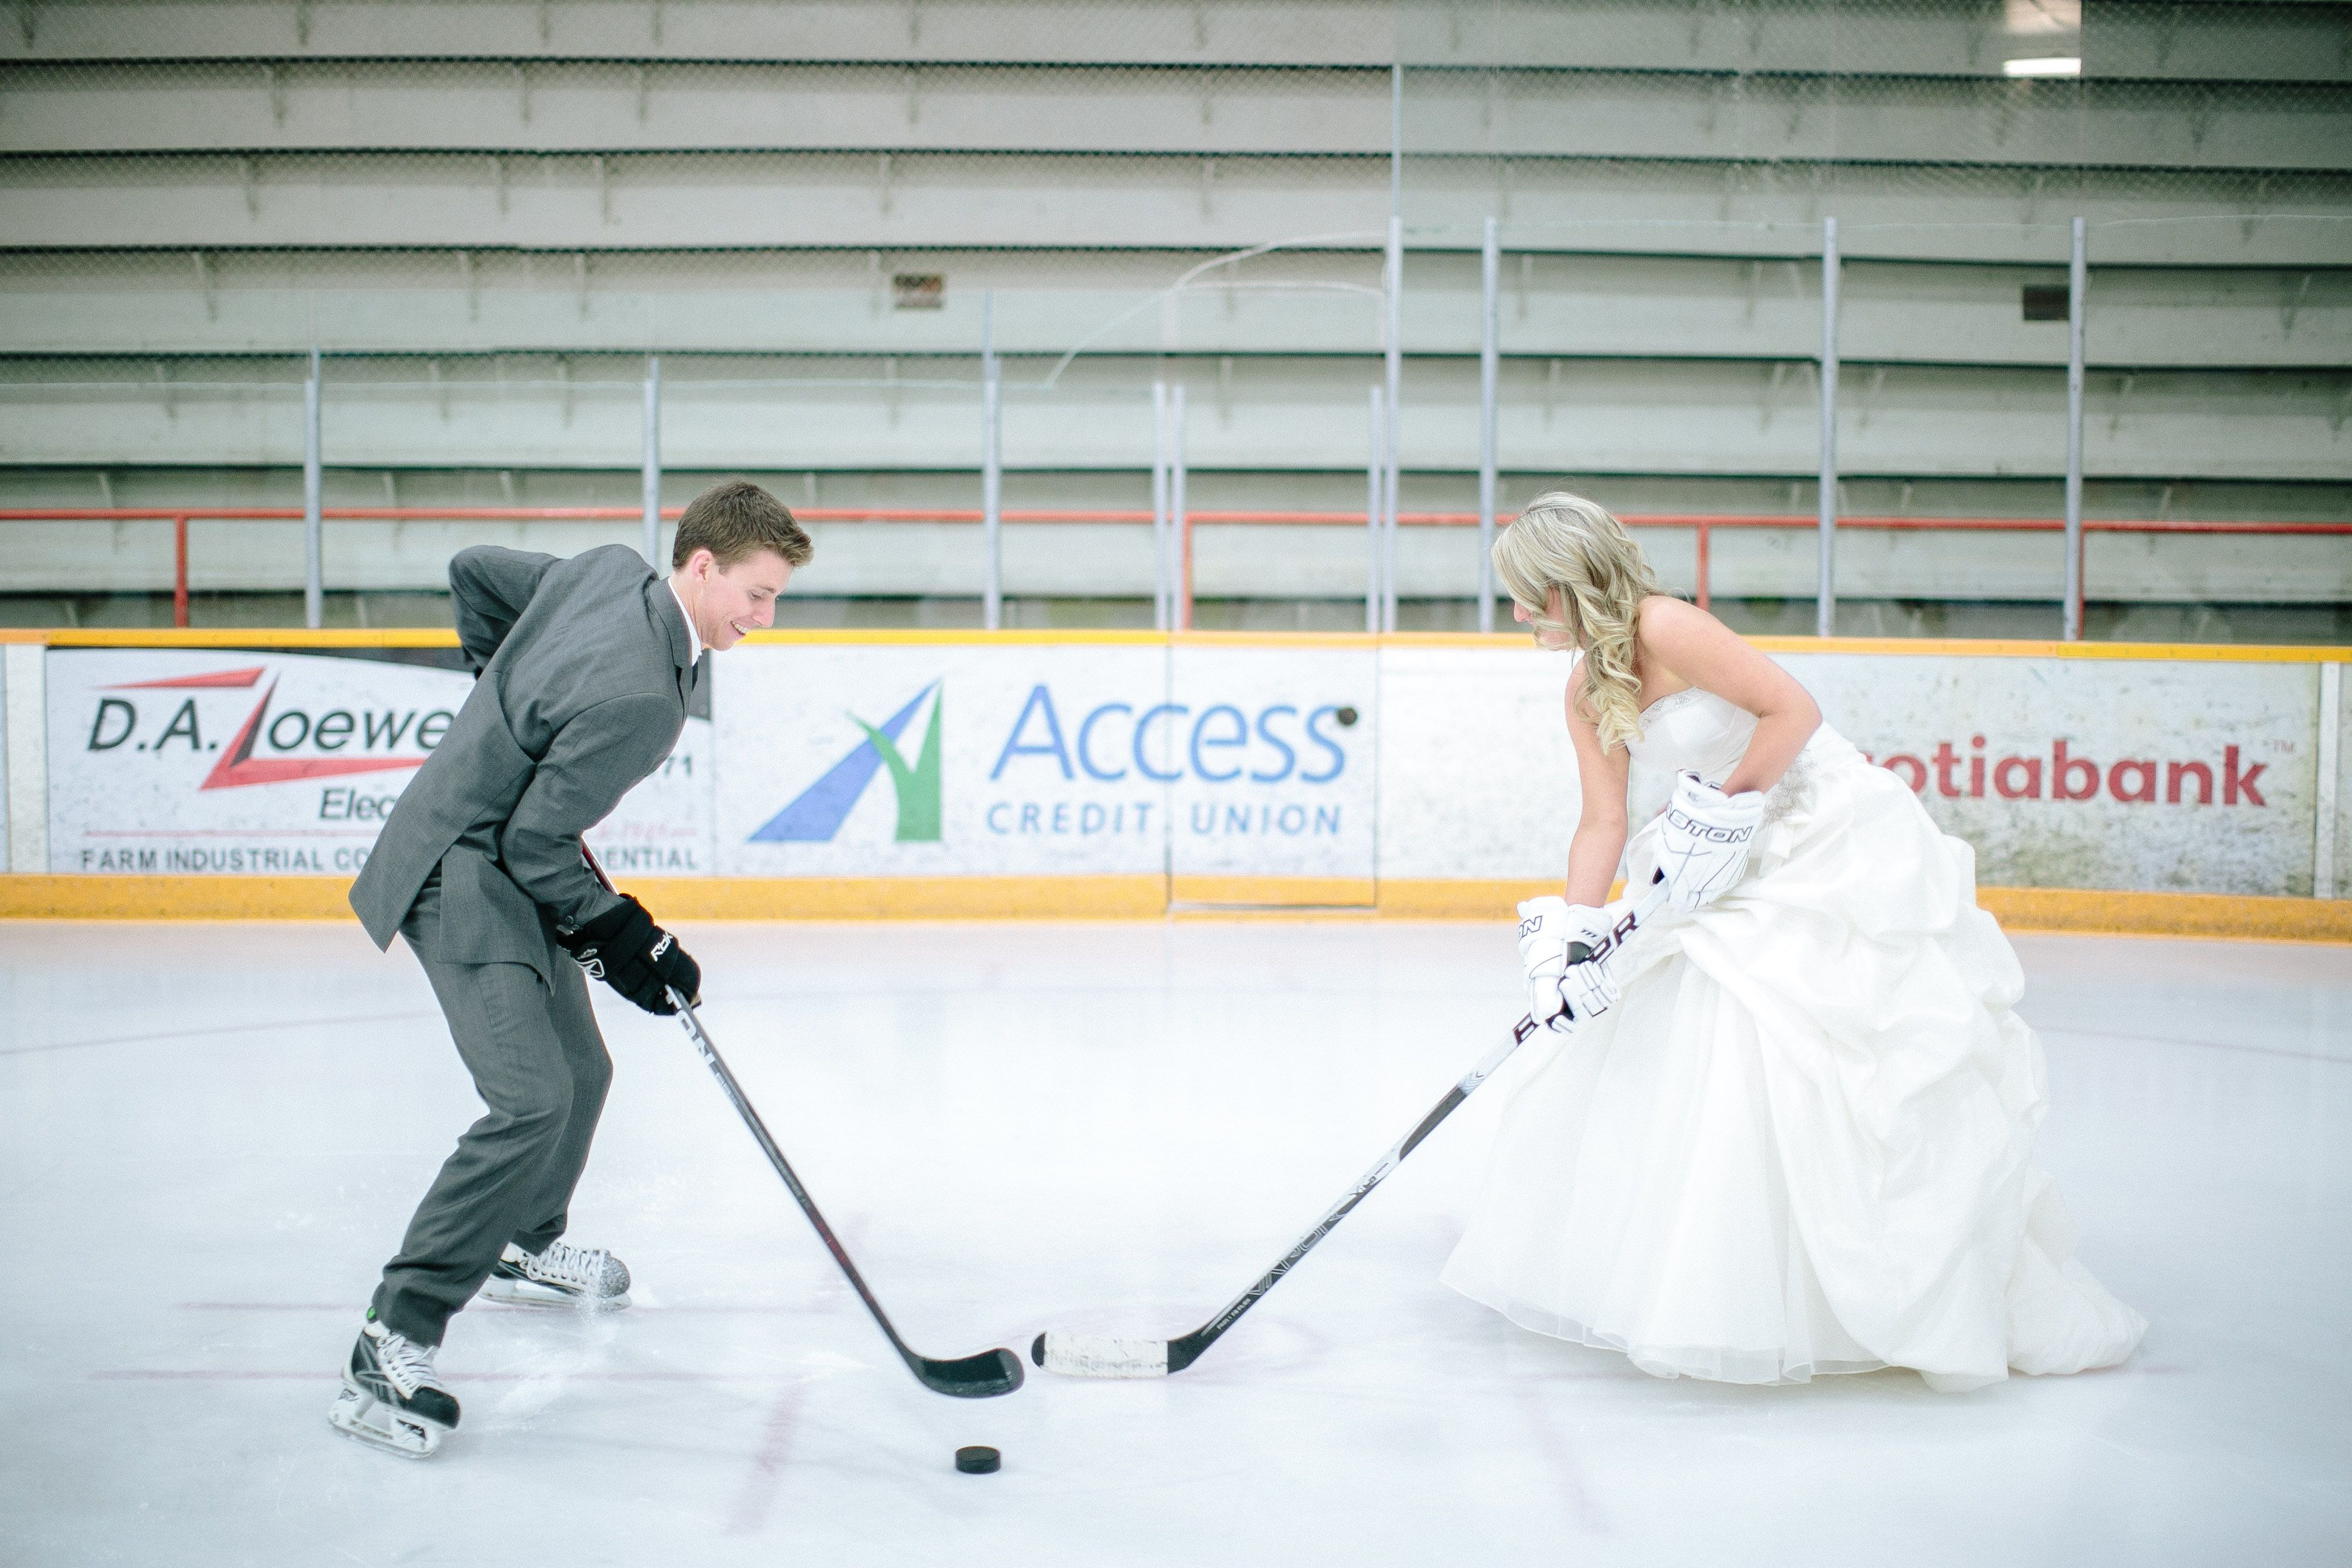 Pin By Lilajoy On Everything Hockey Hockey Wedding Hockey Wedding Theme Hockey Wedding Photos